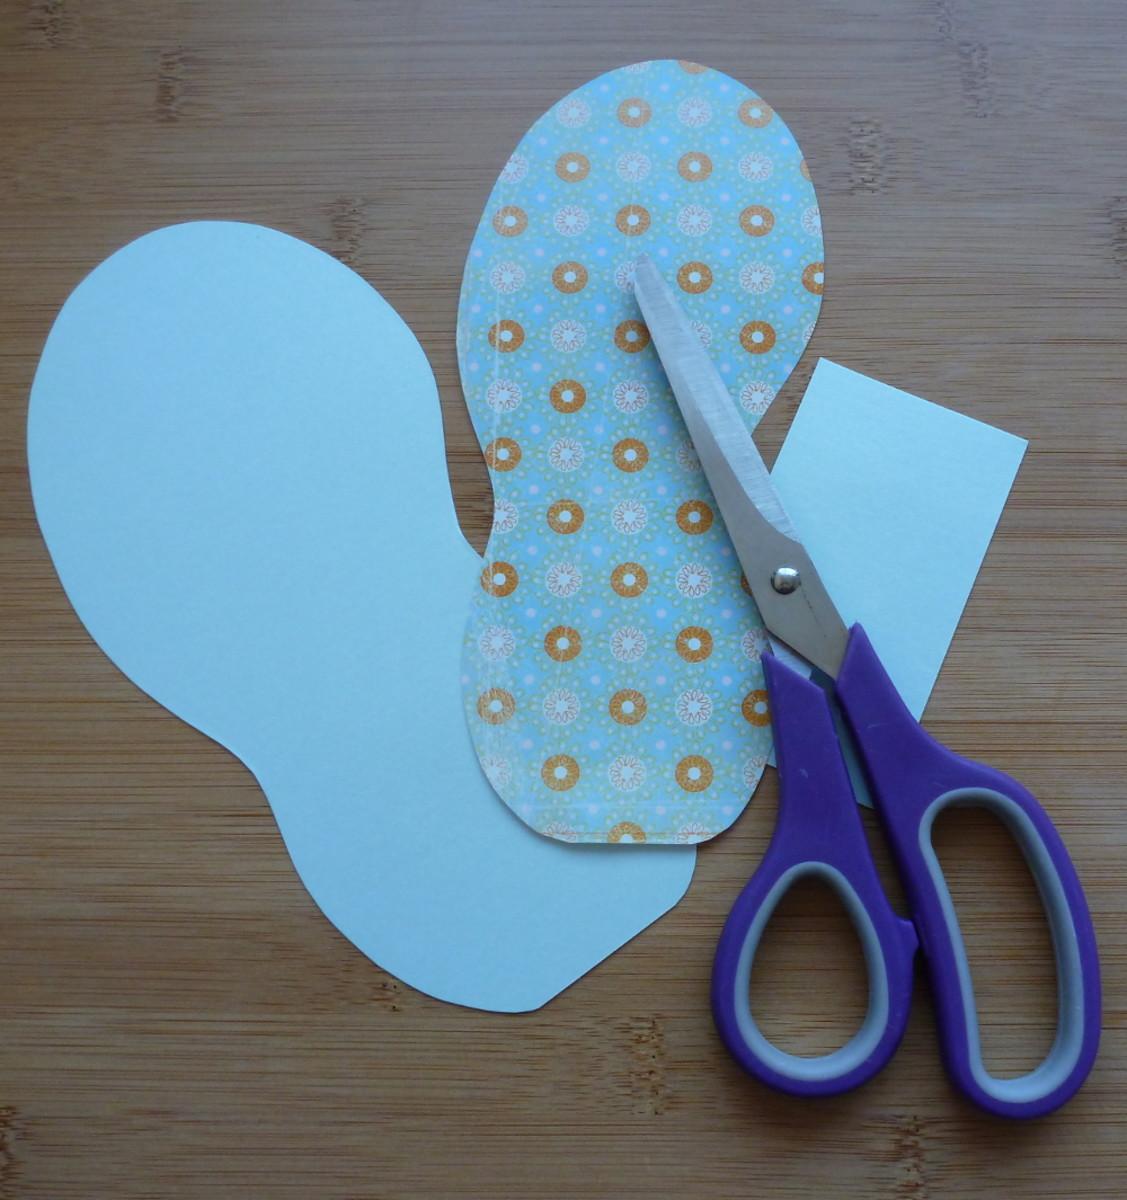 Cutting out flip flop designs.